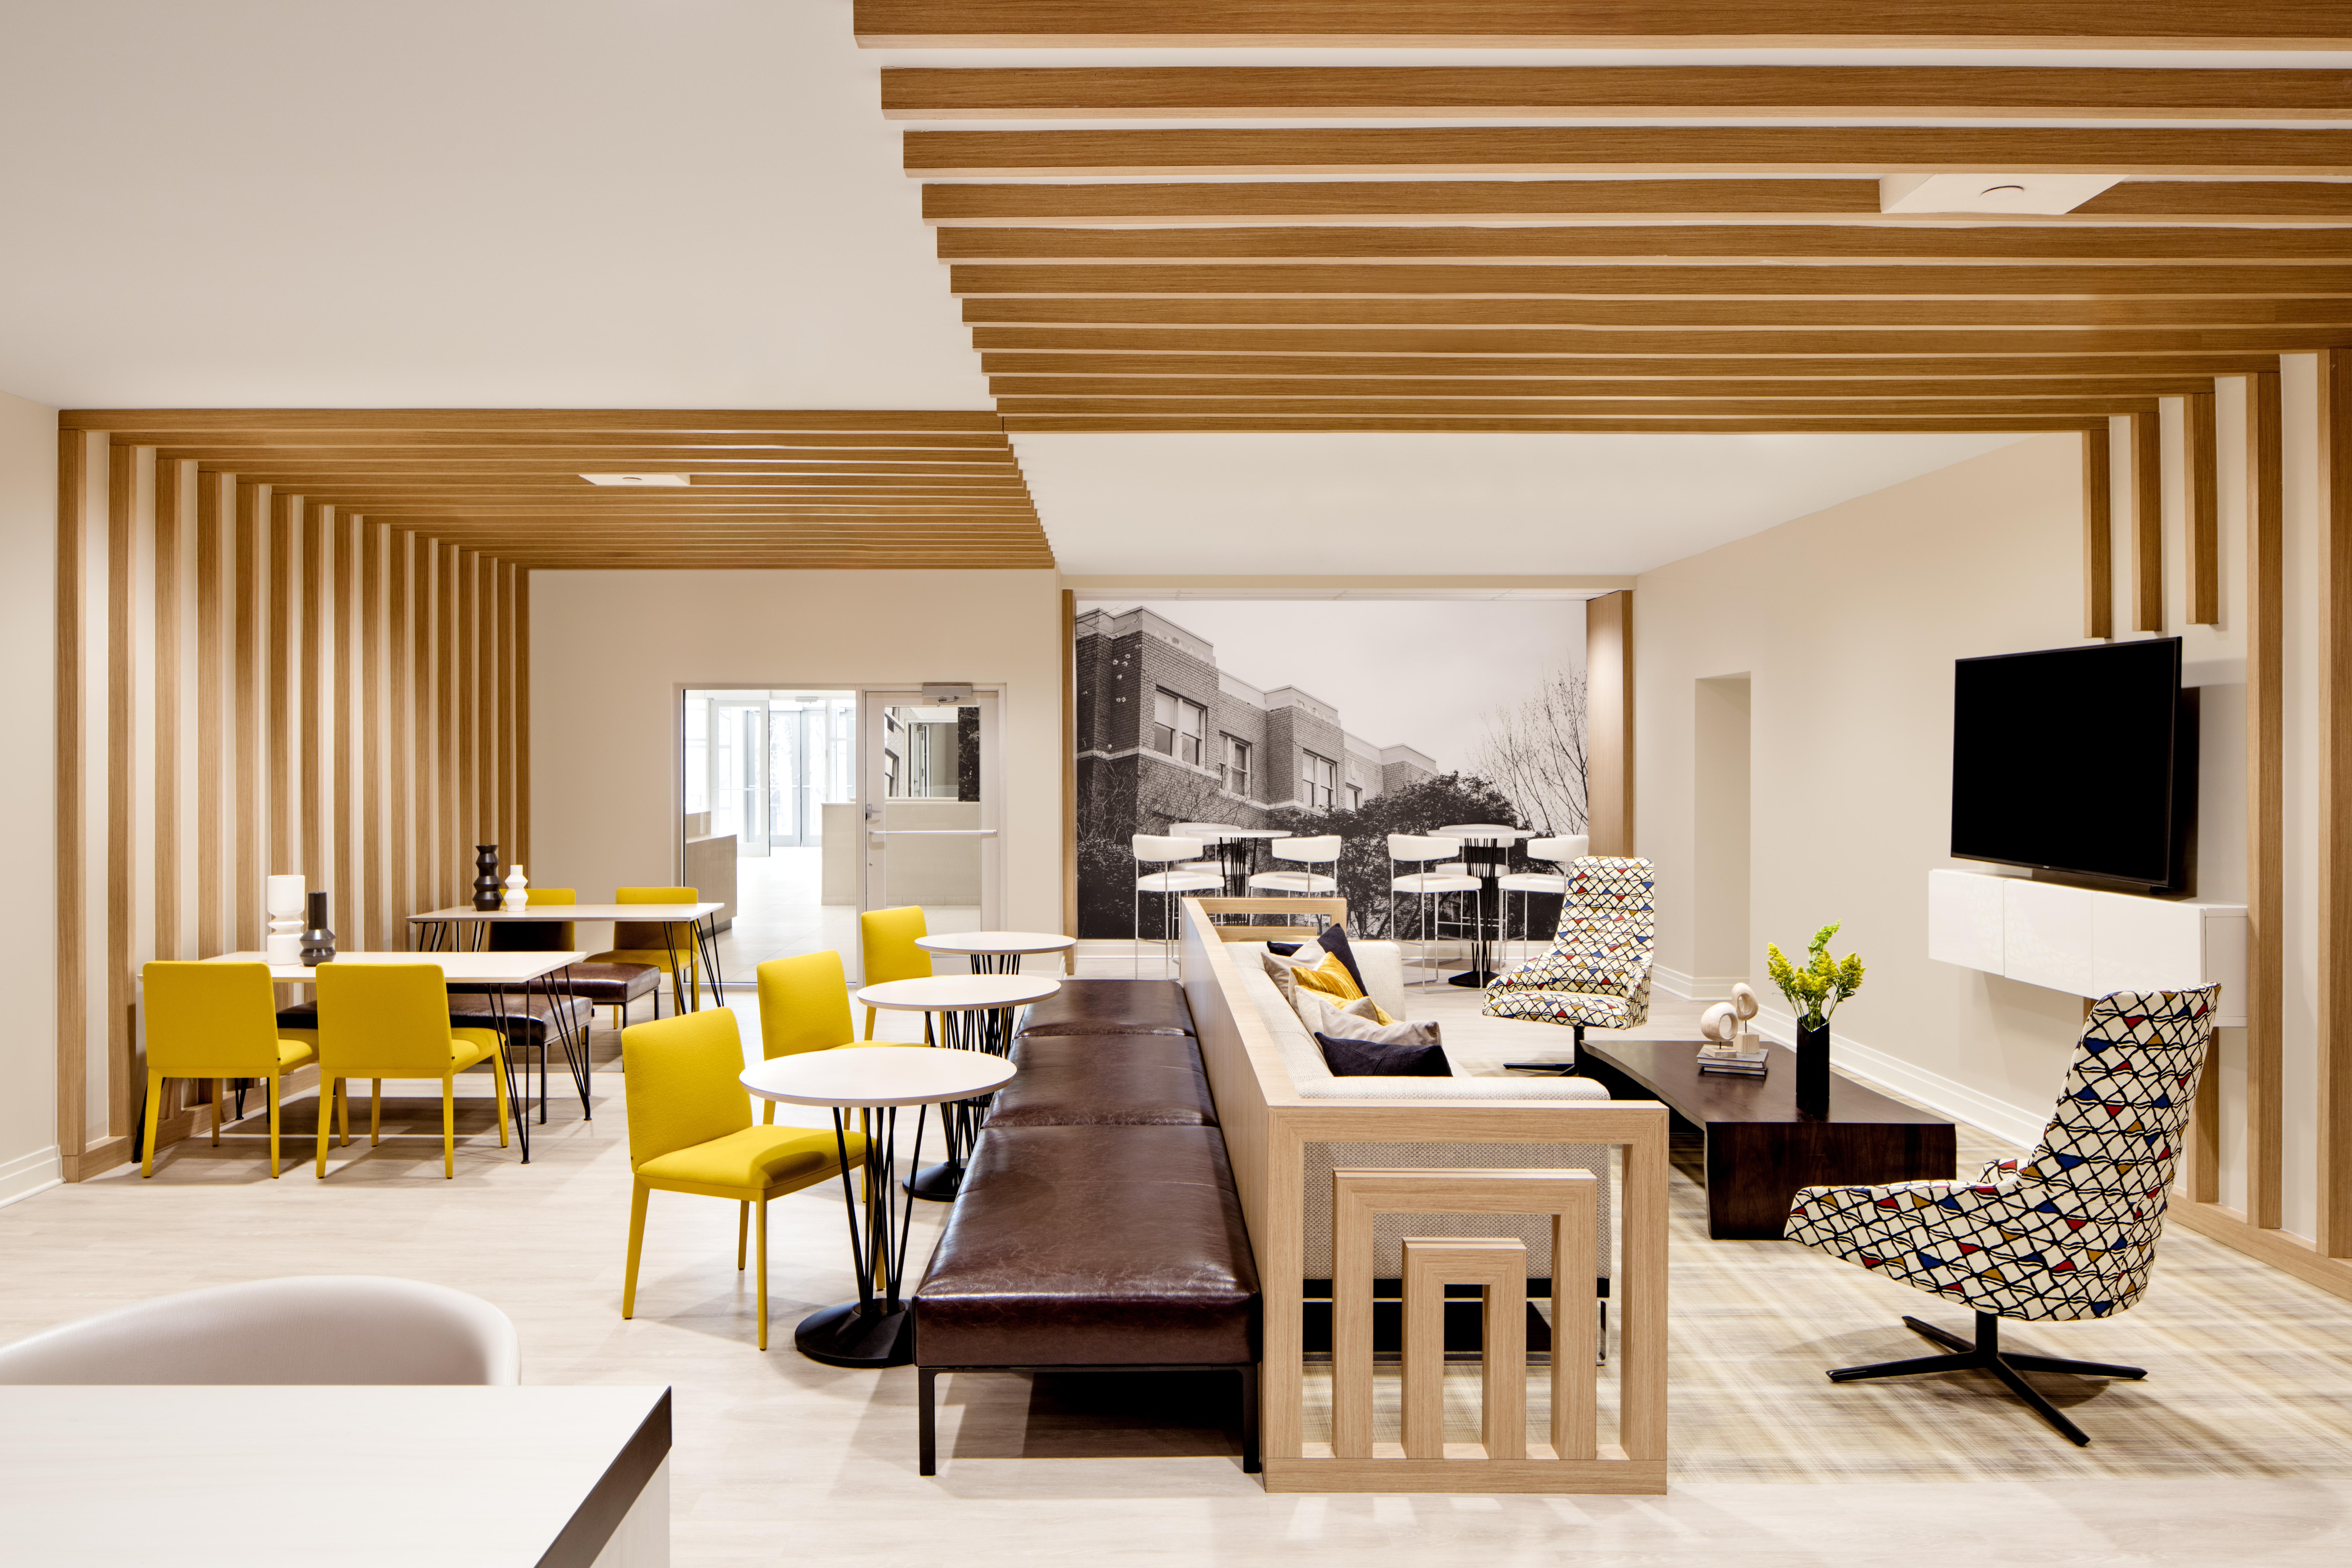 0009 determinedbydesign 01 11 18 large Interior Designer Kia Weatherspoon Strives for 'Design Equity' in DC